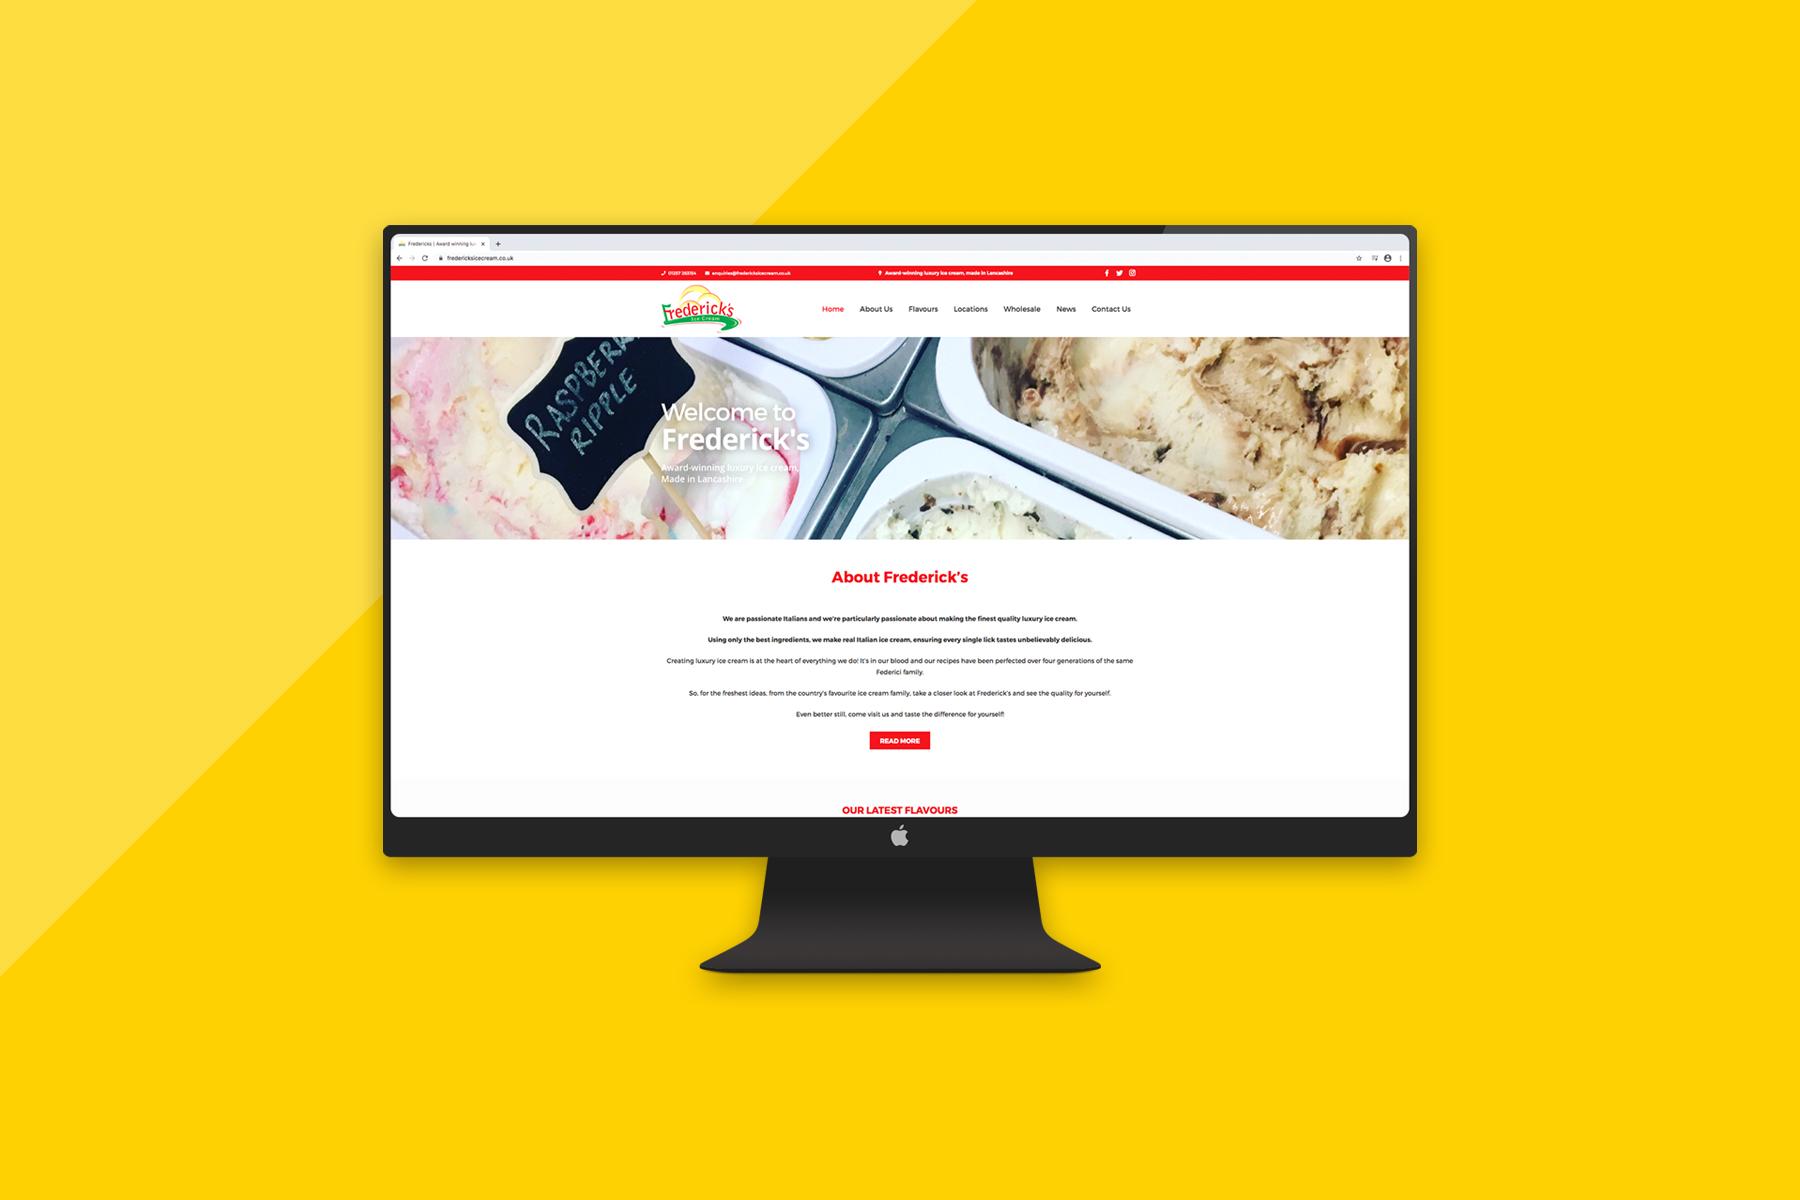 fredericks home page